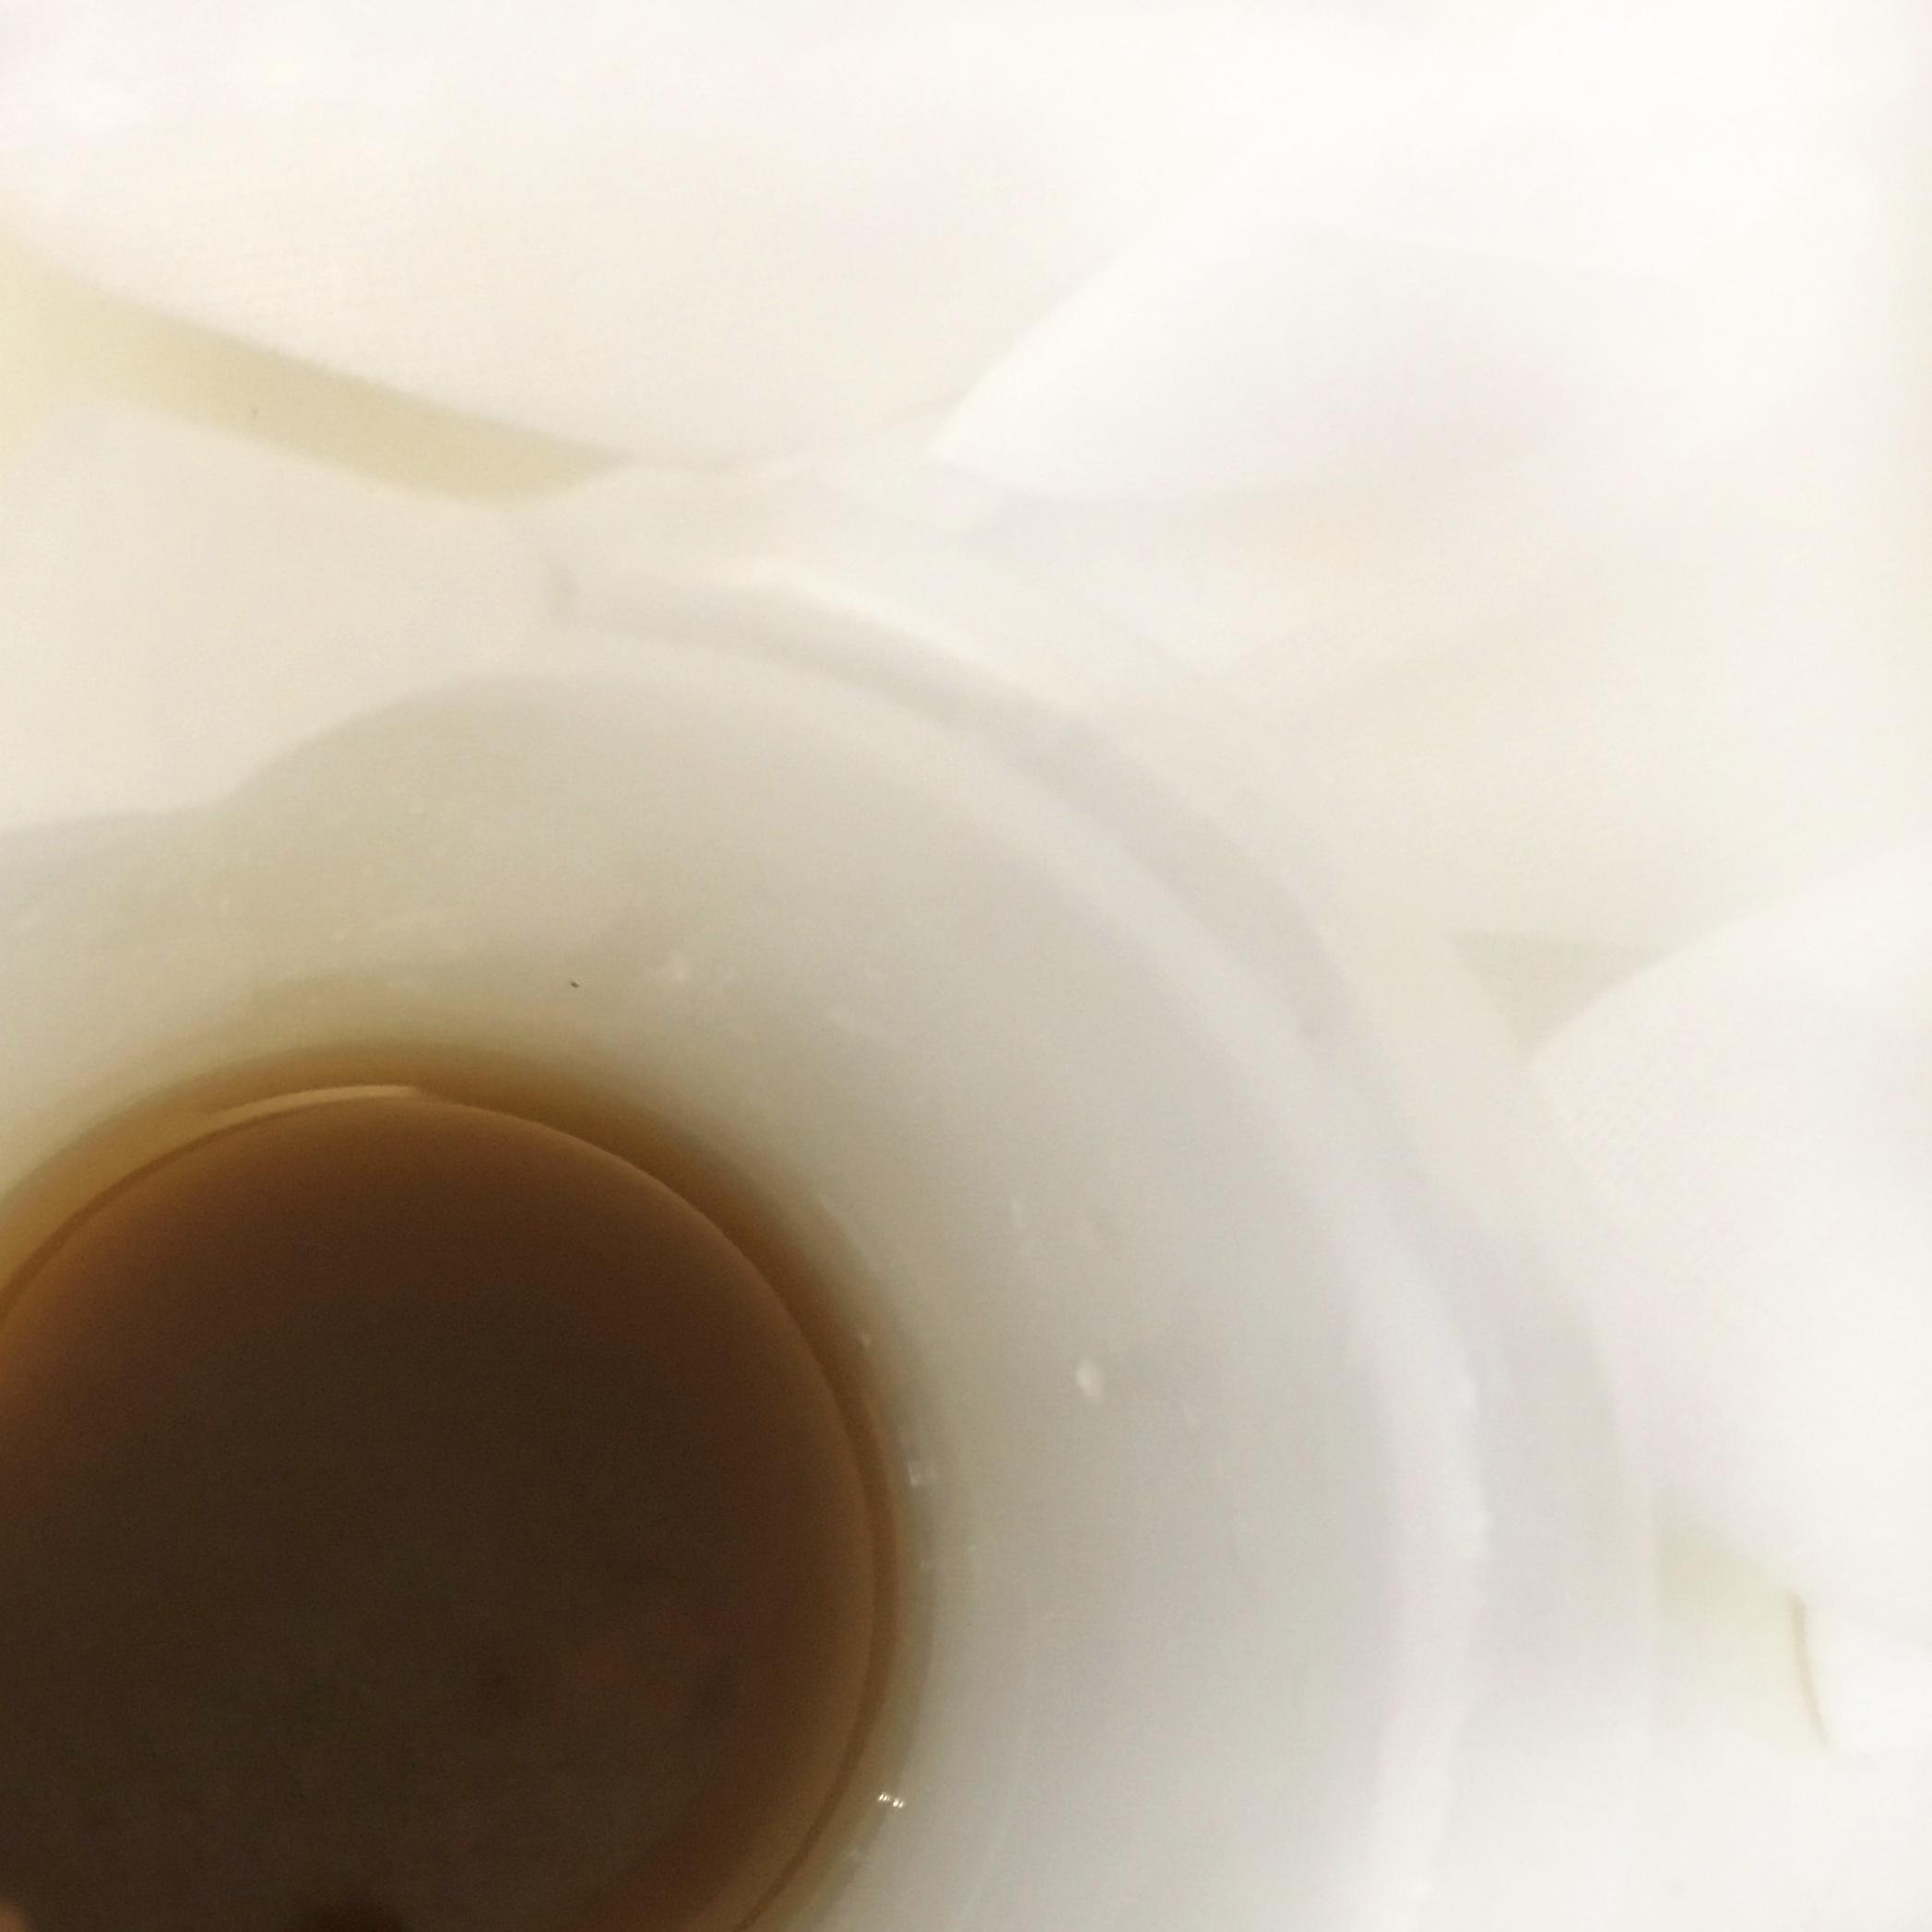 Frank and Myrrh extract in beaker.jpg